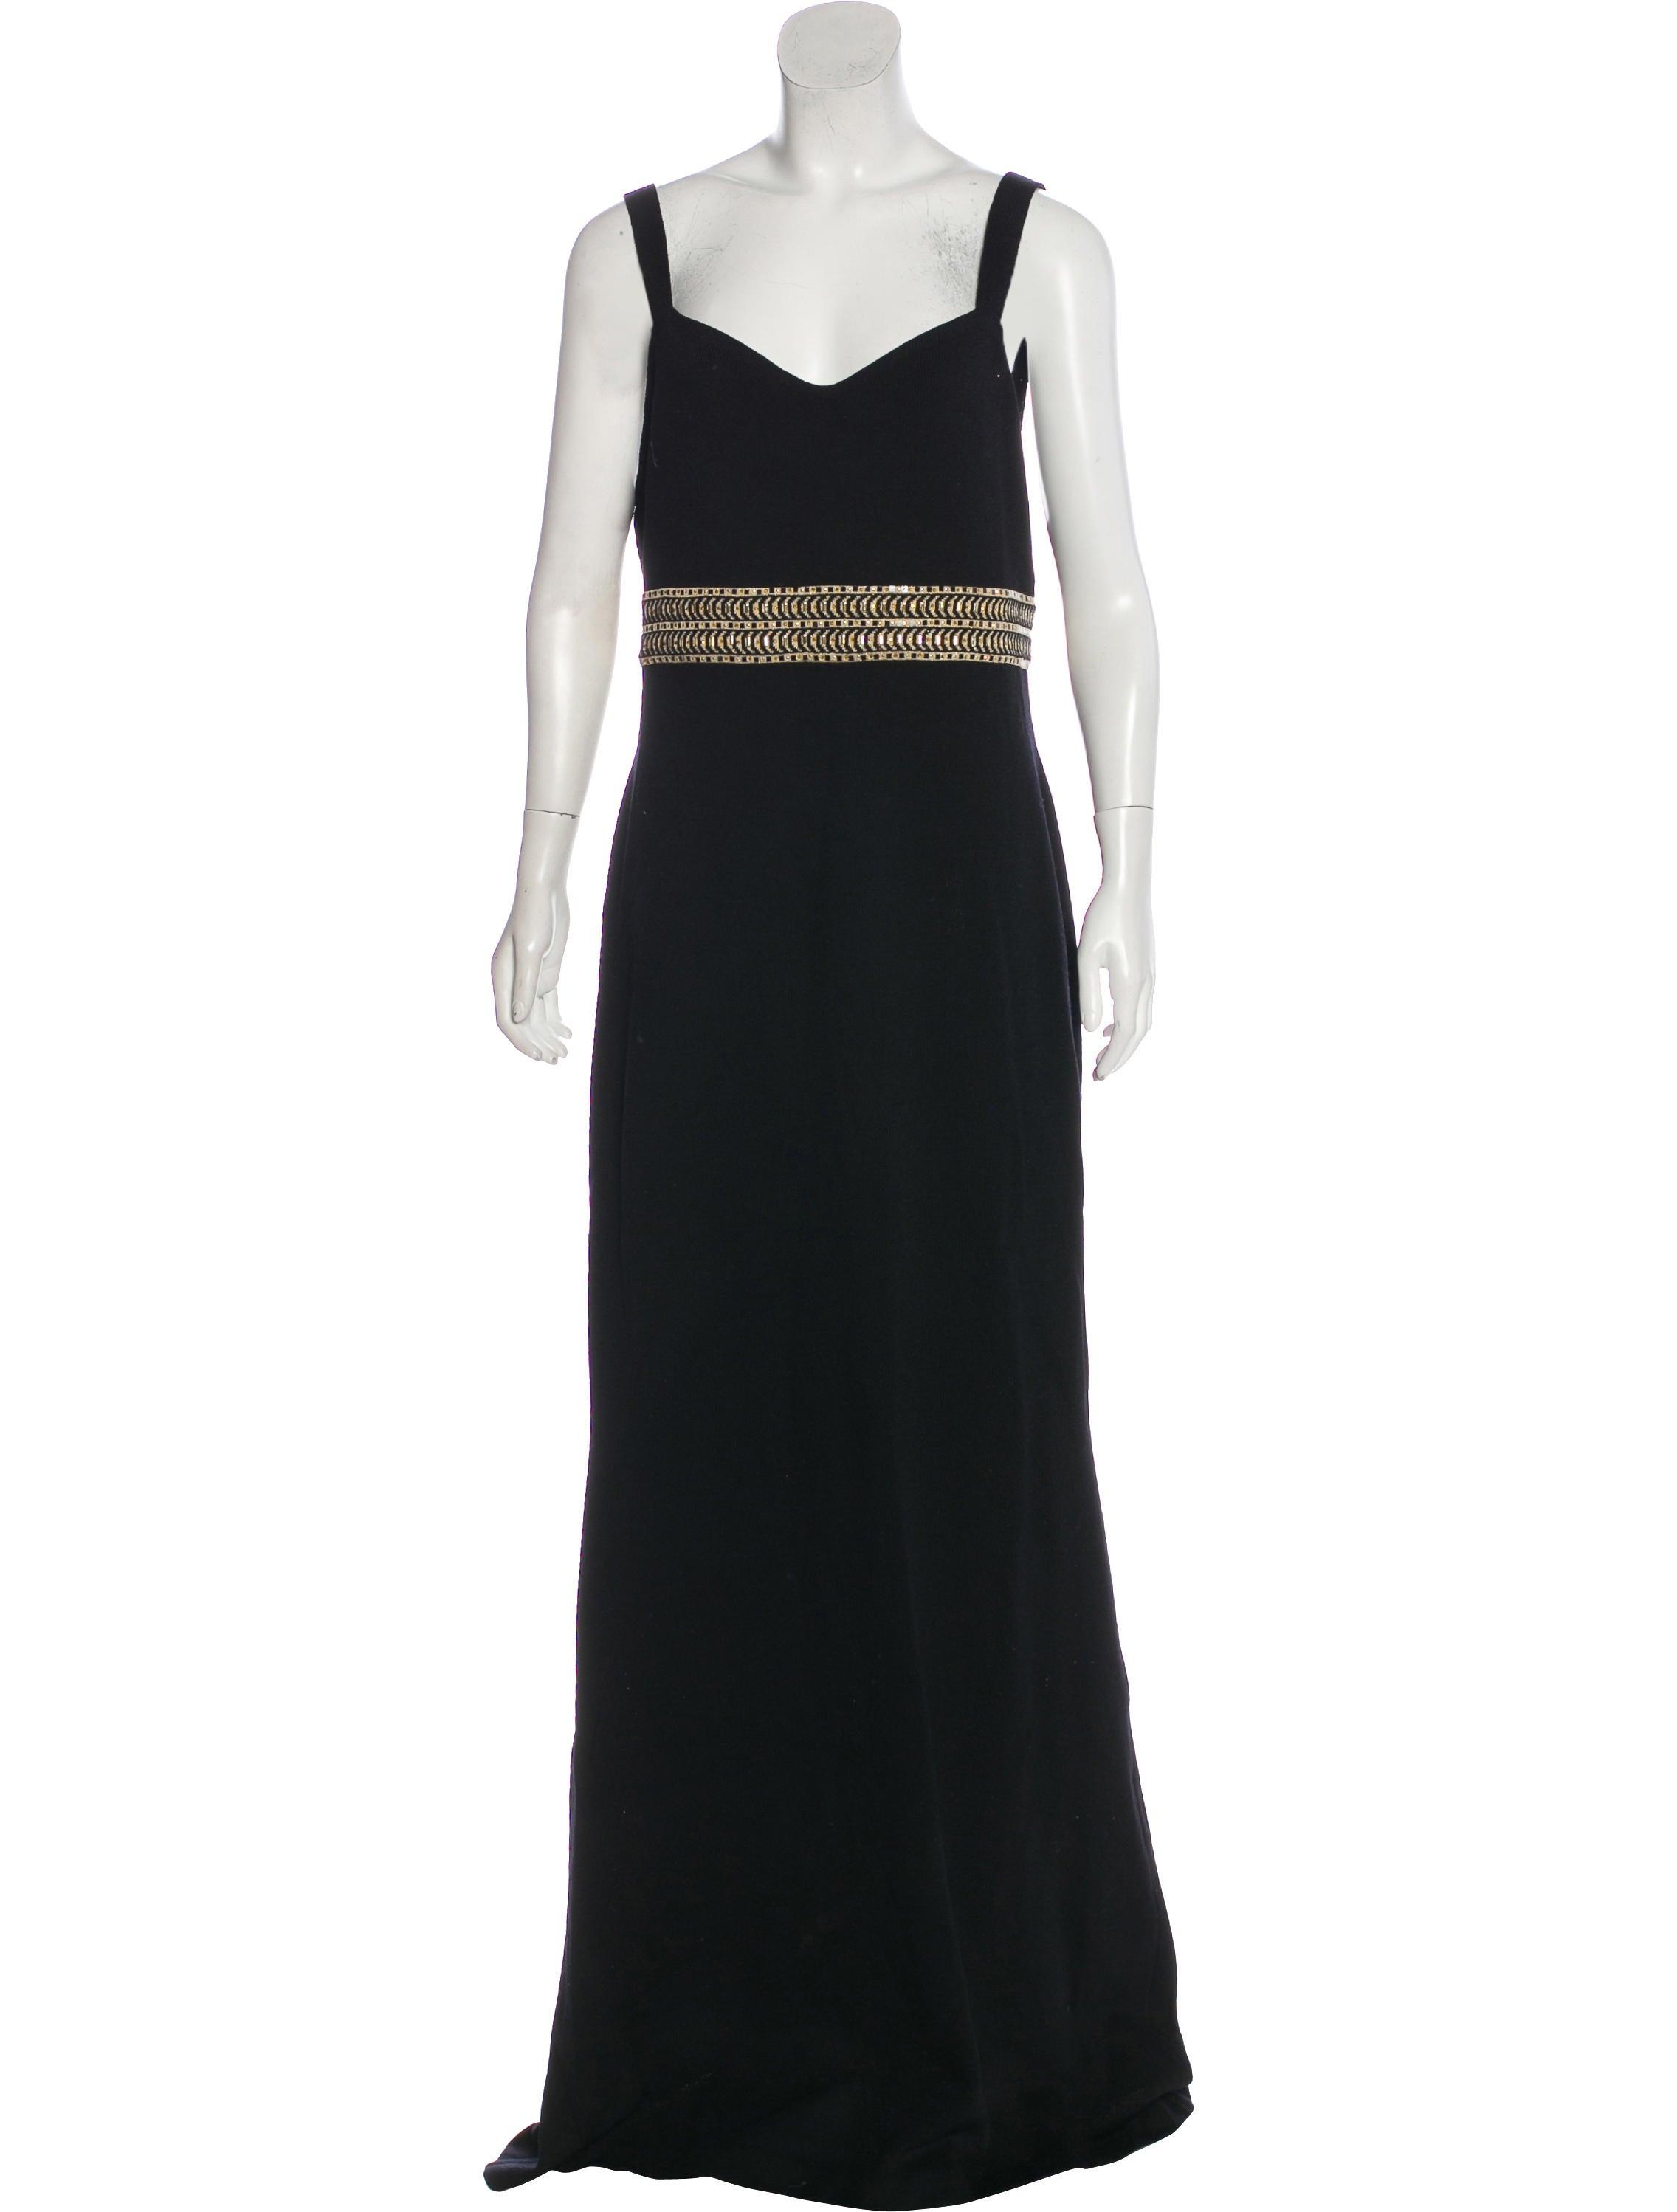 St. John Sleeveless Evening Dress - Clothing - STJ25236 | The RealReal